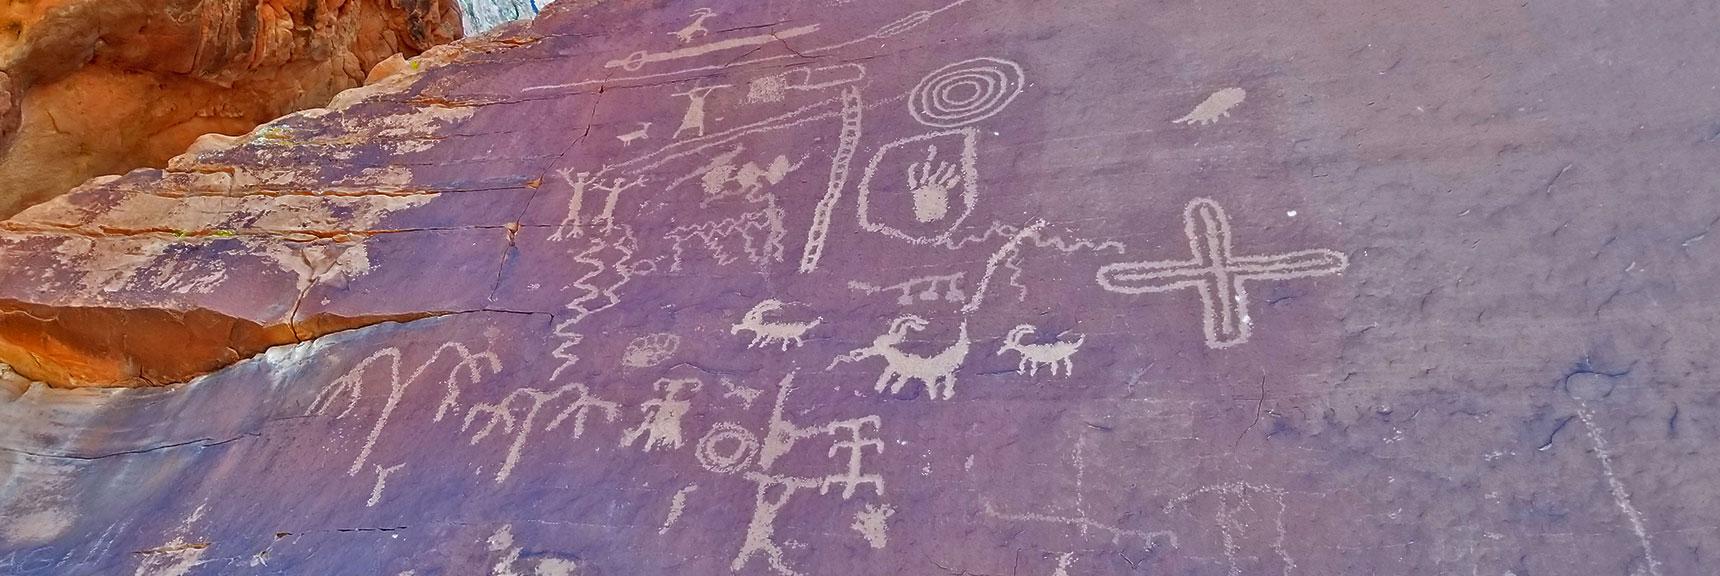 Atlatl Rock Petroglyphs in Valley of Fire State Park, Nevada Slide 2